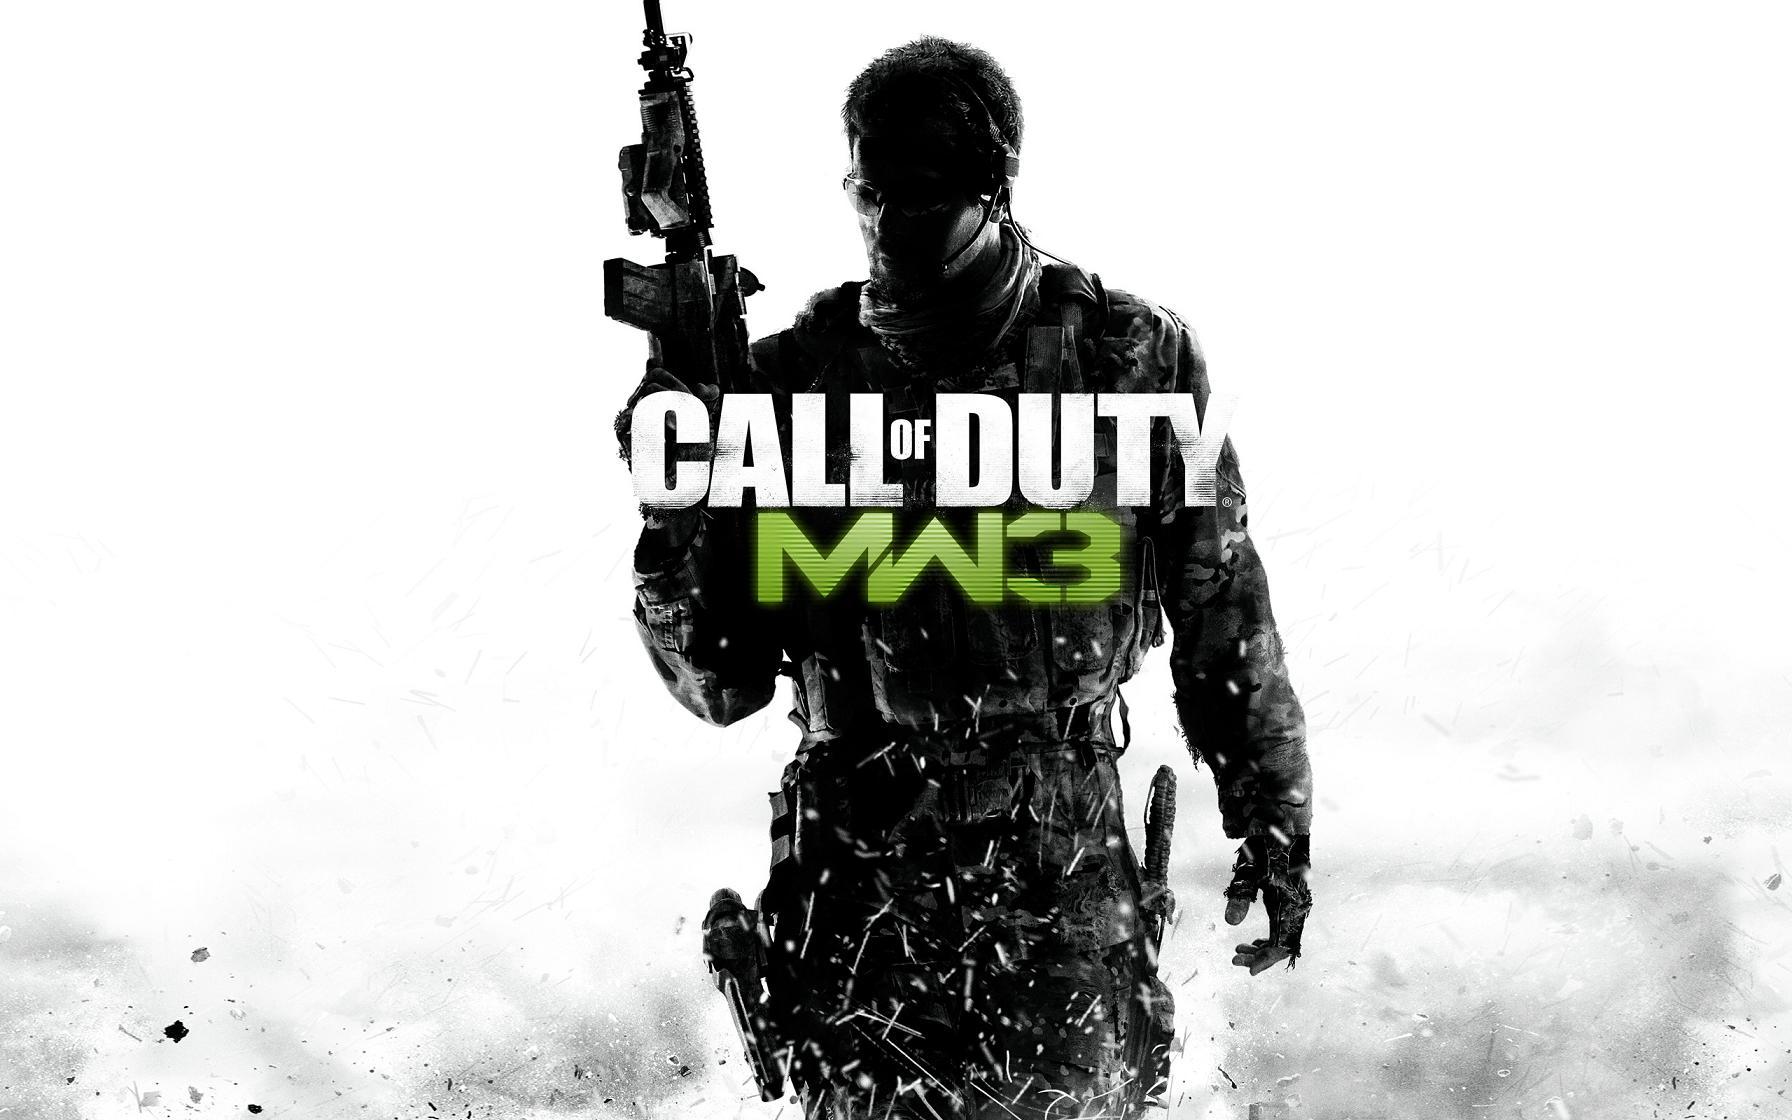 Call Of Duty Special Edition Animated Wallpaper DesktopAnimatedcom 1792x1120